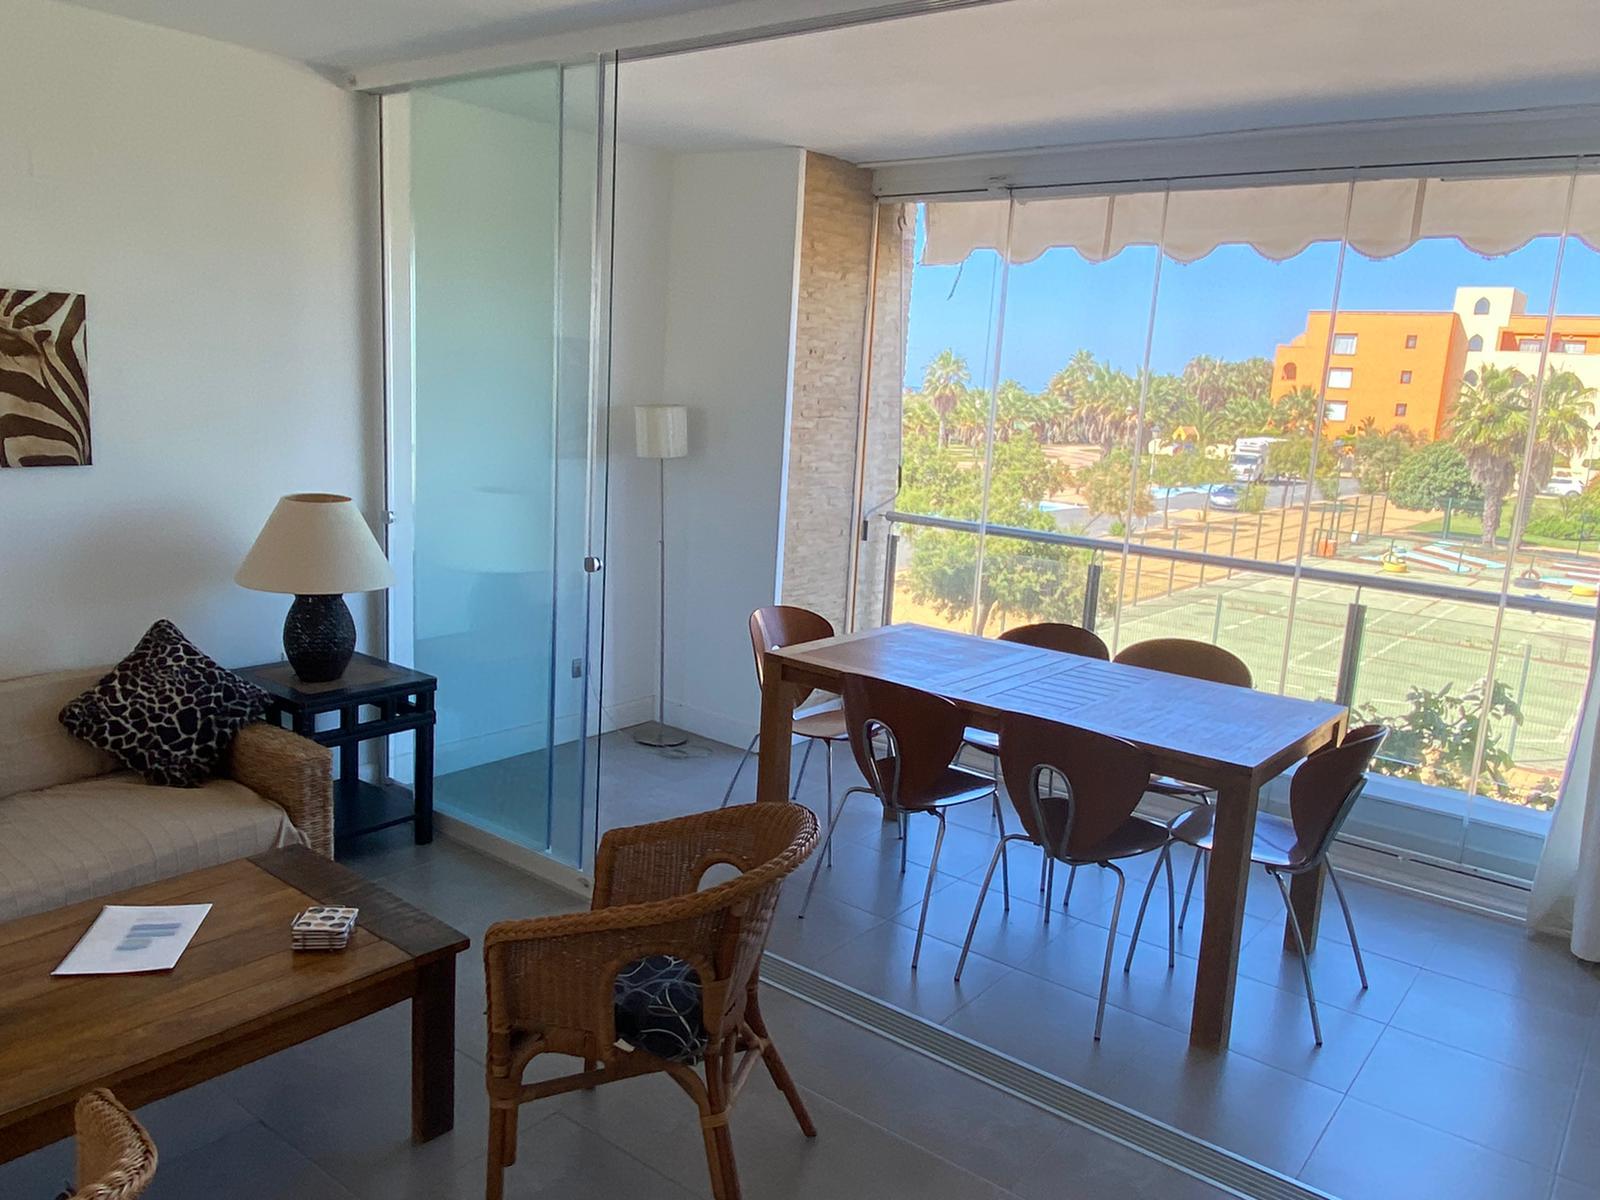 Imagen 1 del Apartamento en El Espigón, 1ª Planta nº4 Poniente (3d+2b), Punta del Moral (HUELVA), Paseo de la Cruz nº22